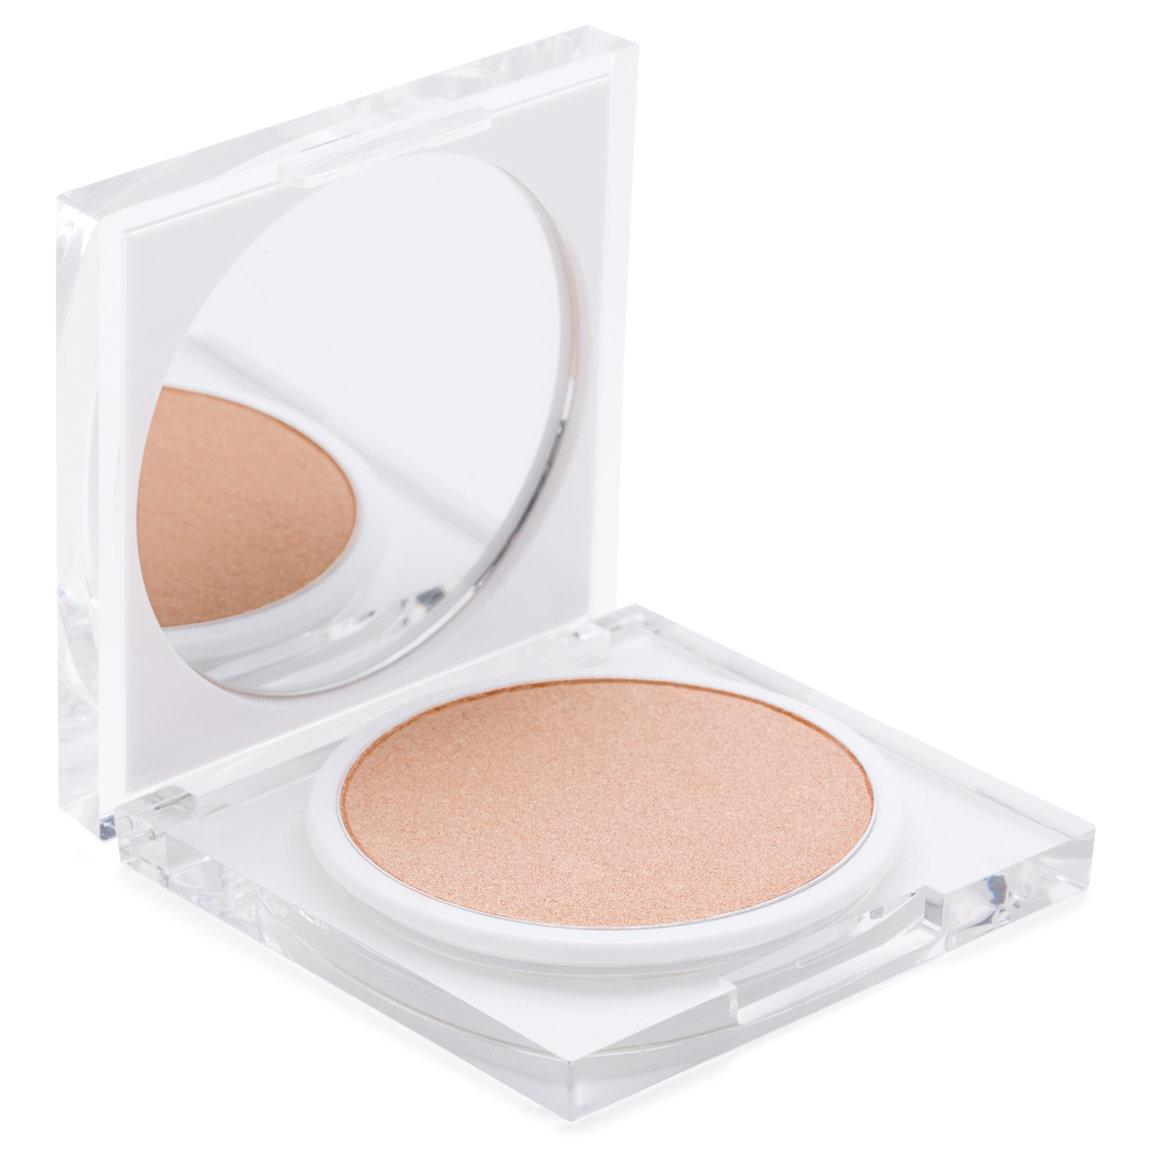 rms beauty Luminizing Powder Grande Dame